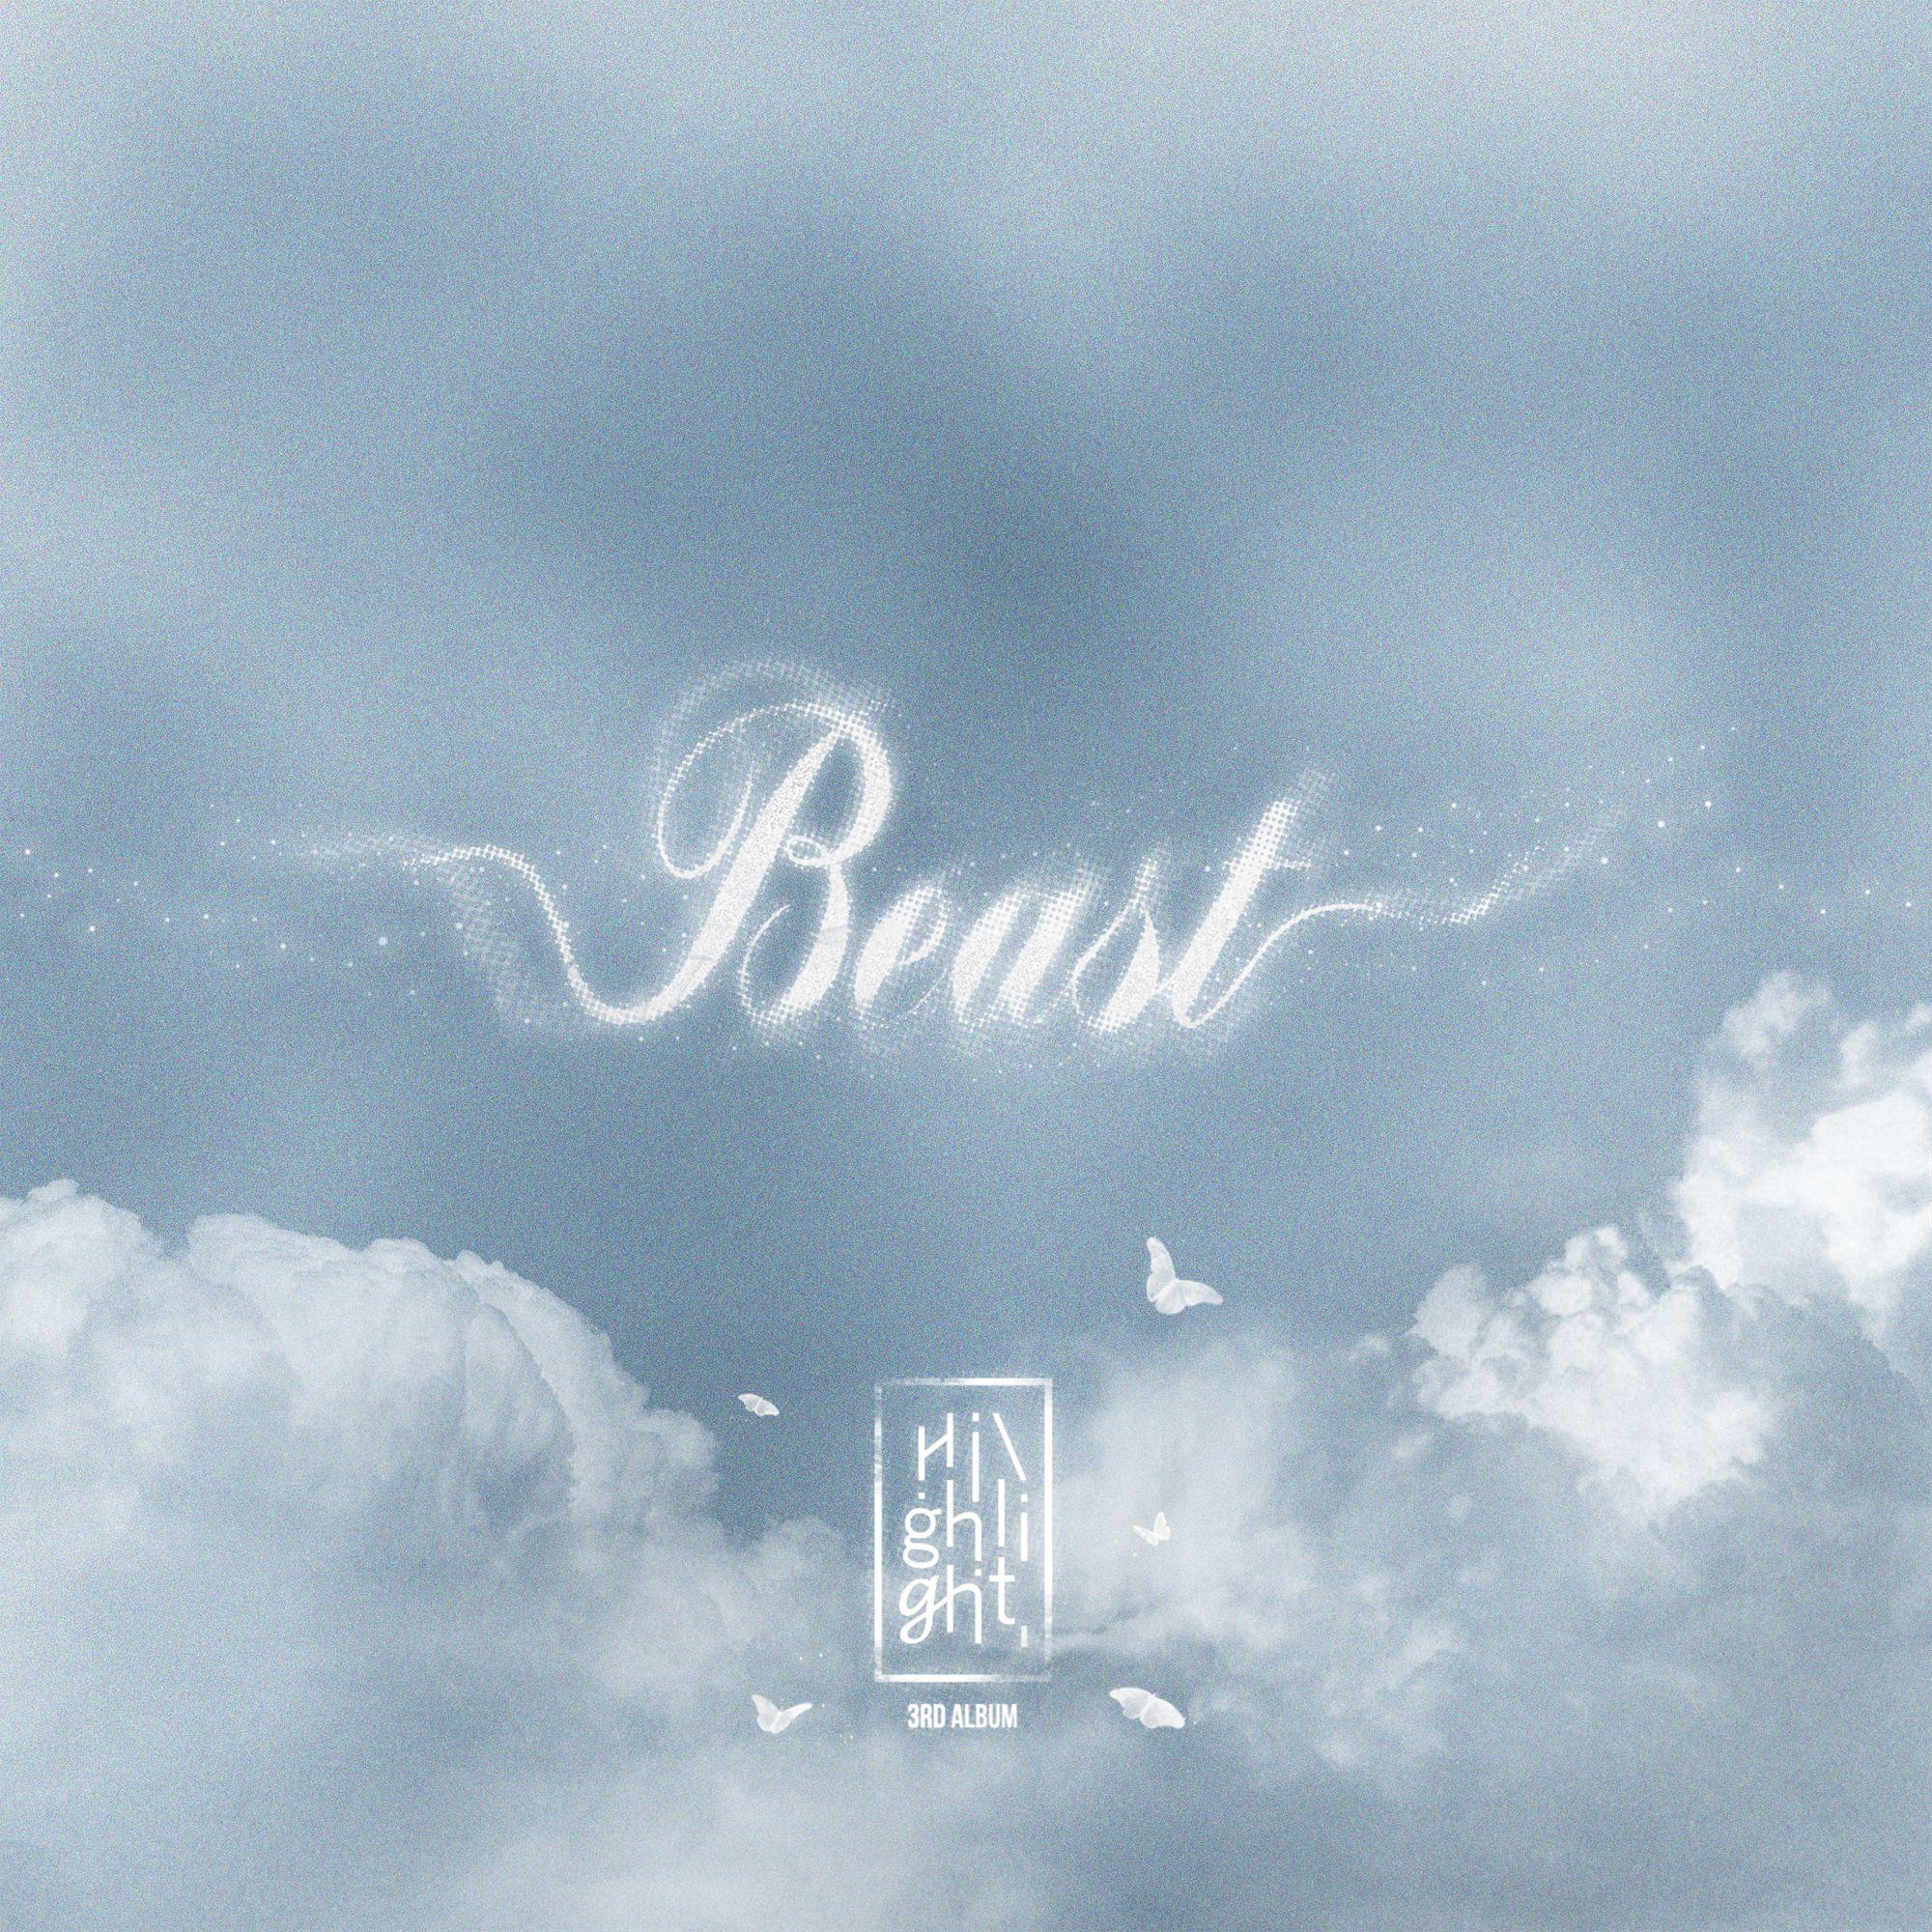 beasthighlightcover01